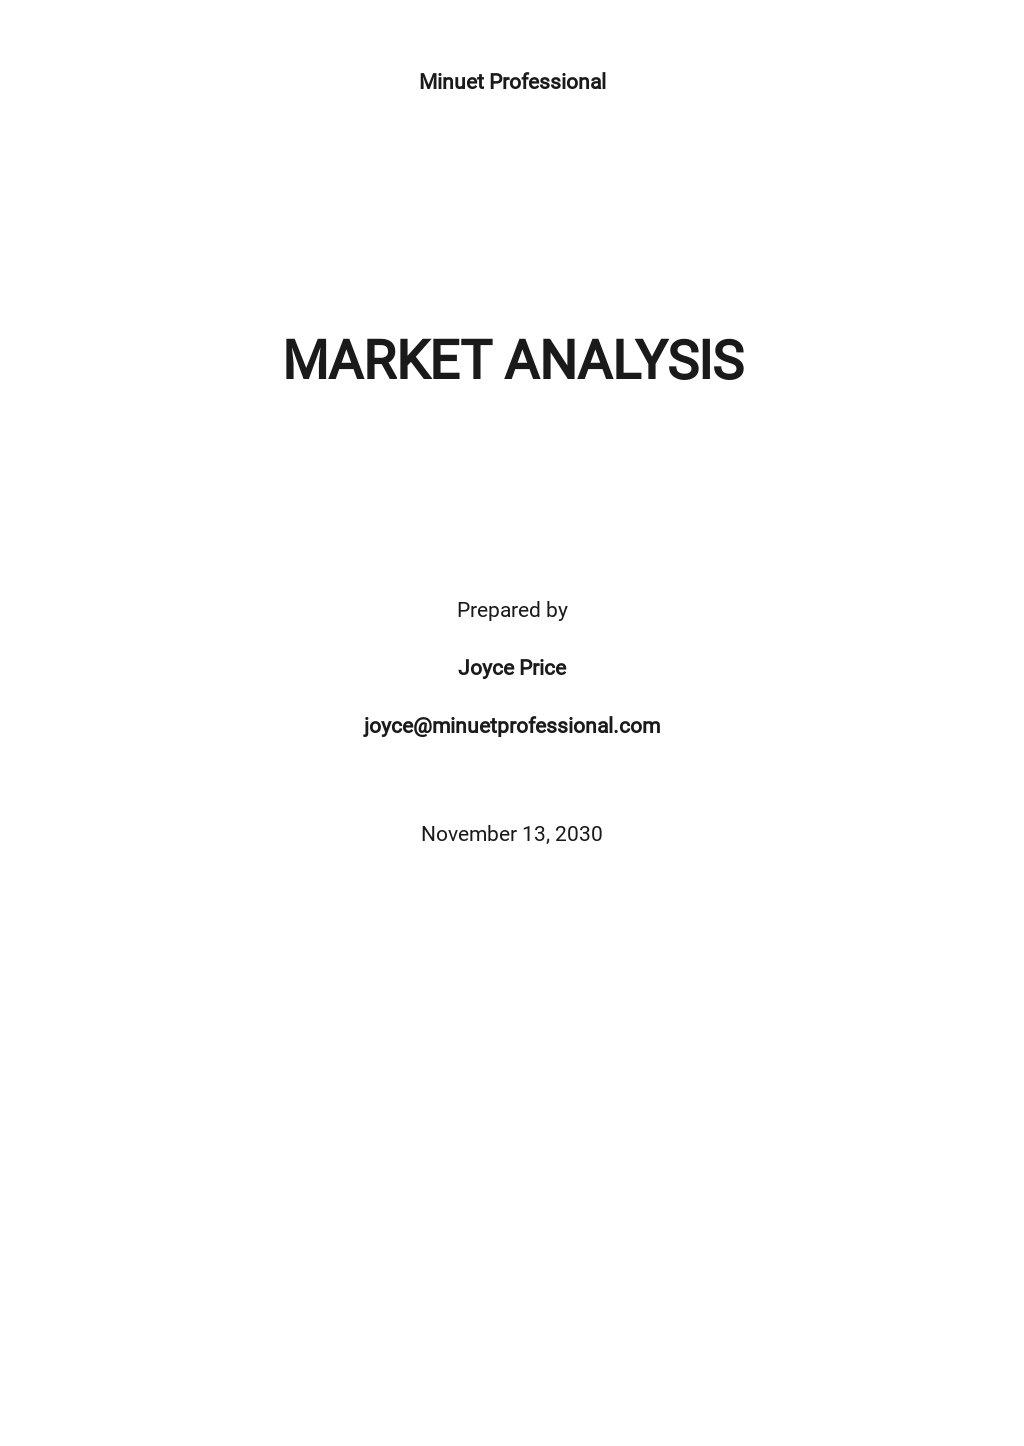 Product Market Analysis Template.jpe